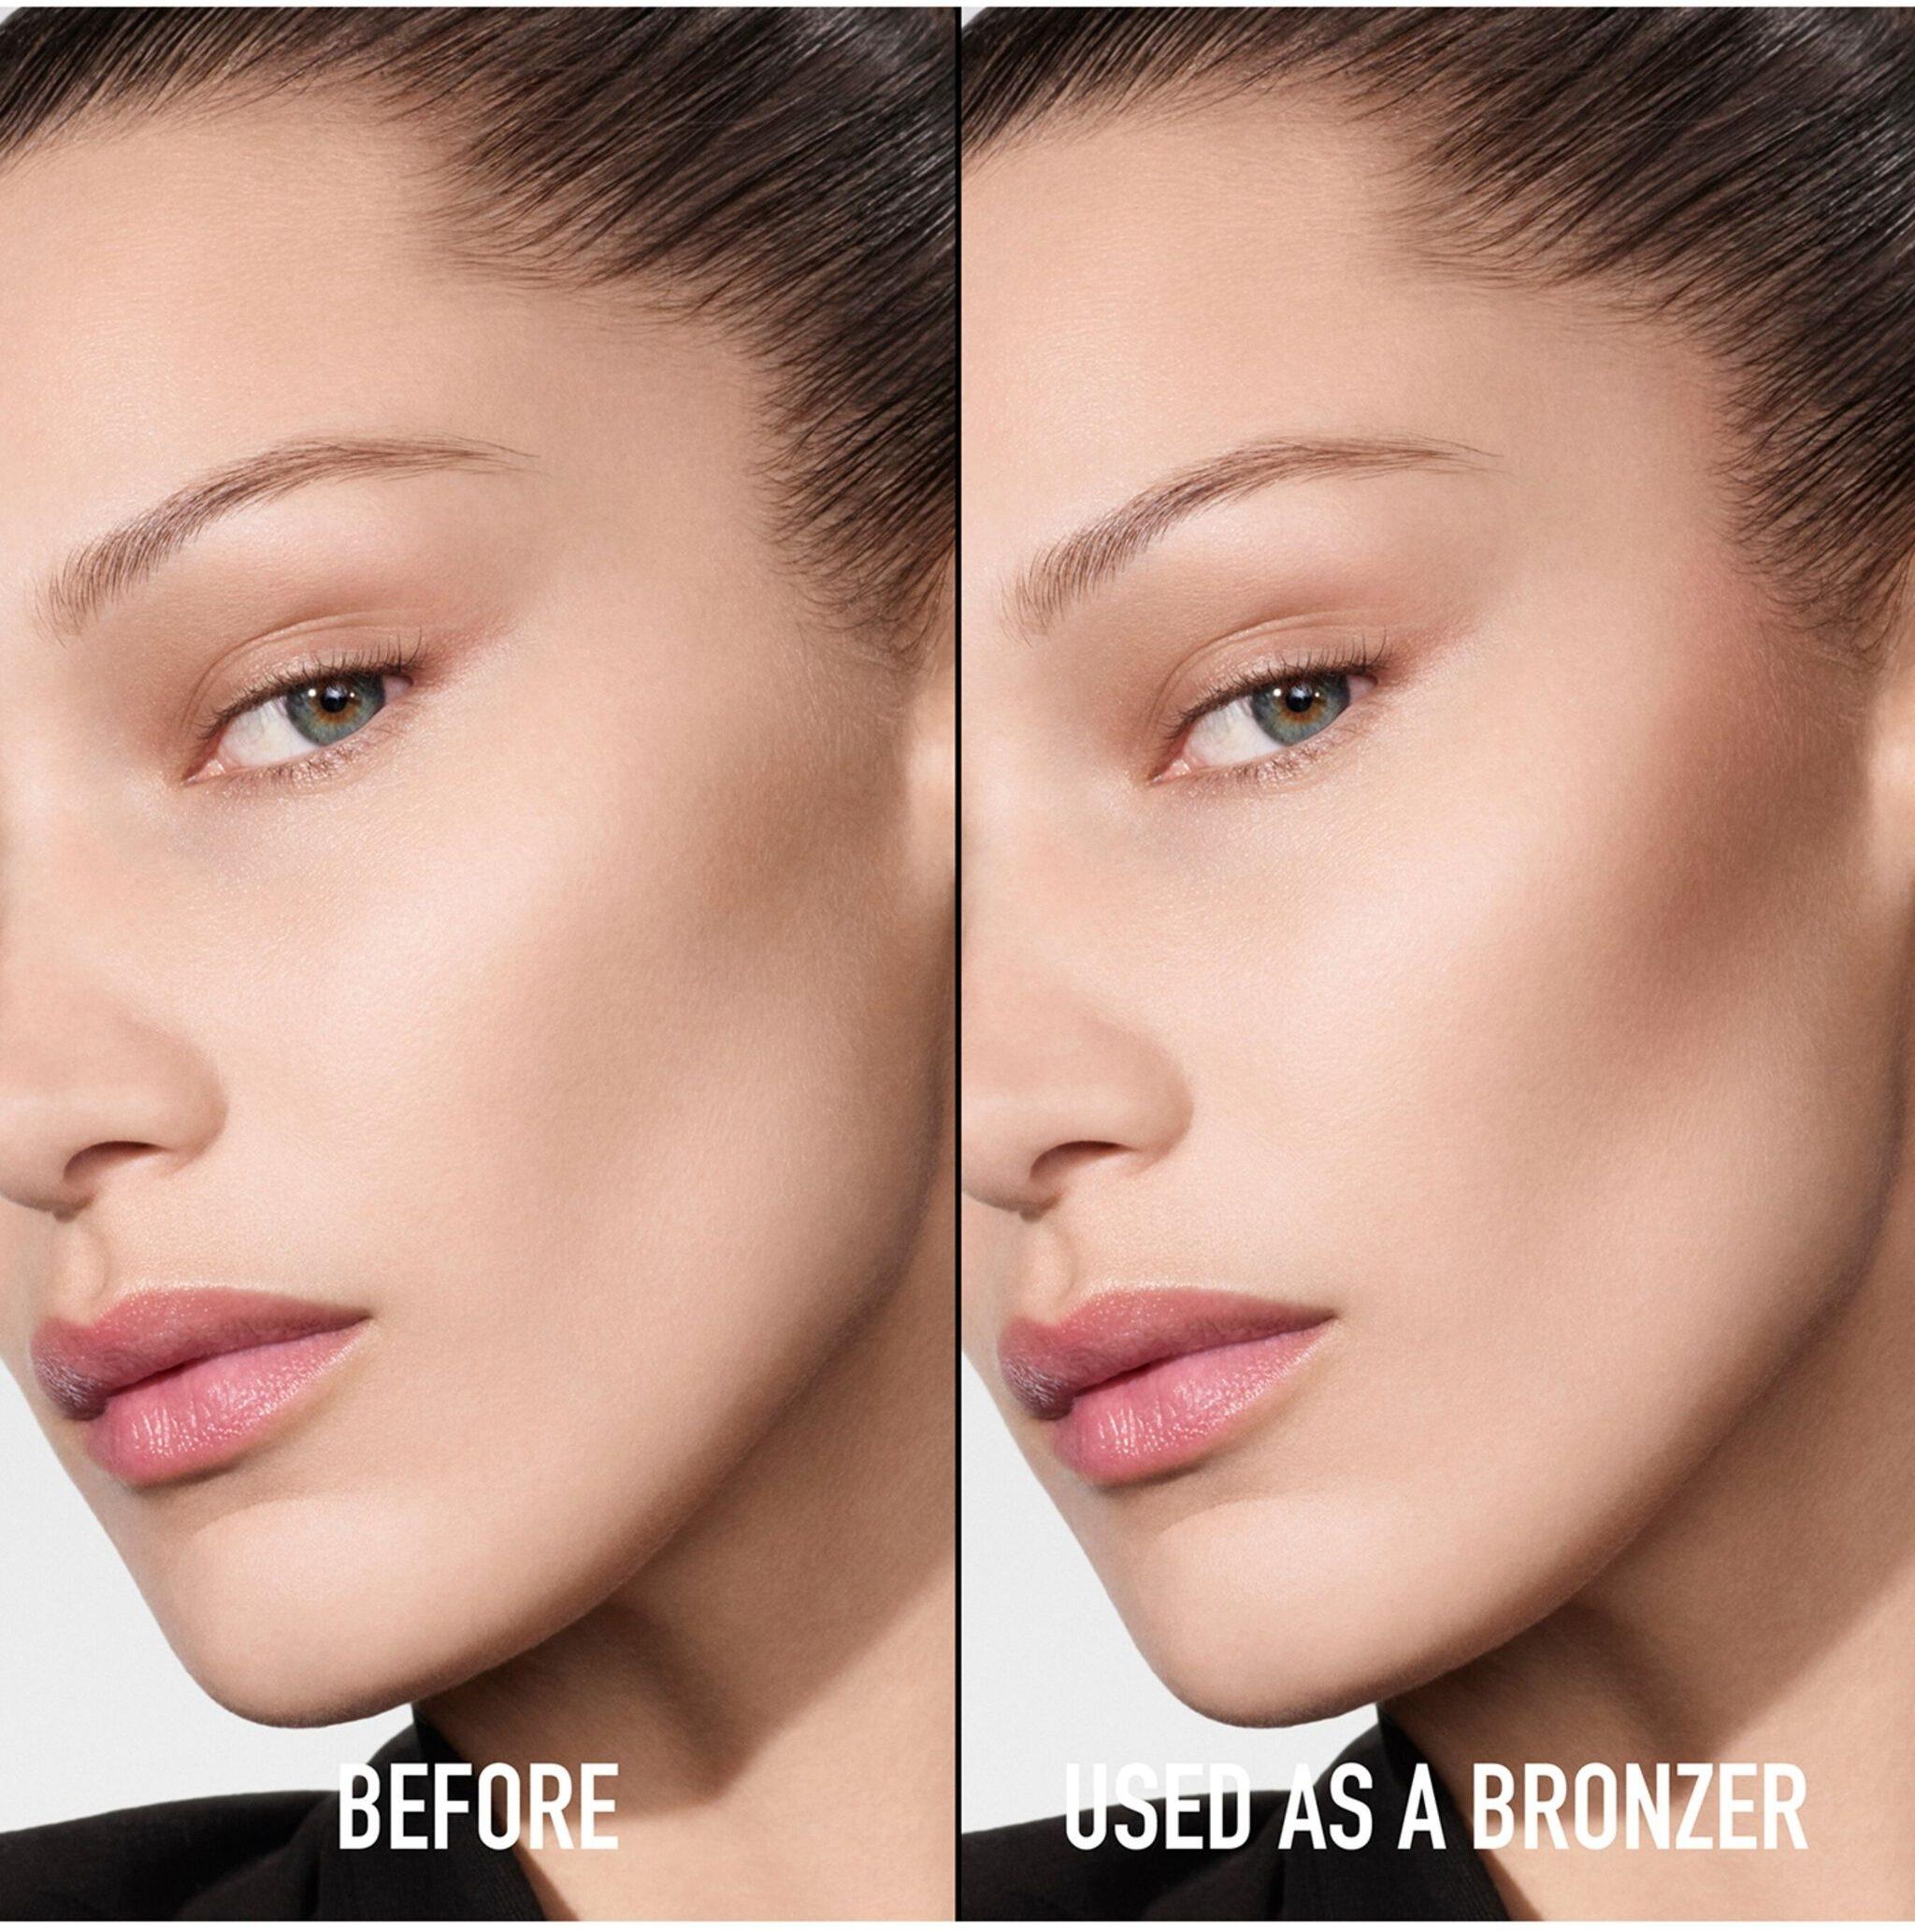 DIOR Backstage Face & Body Powder-No-Powder